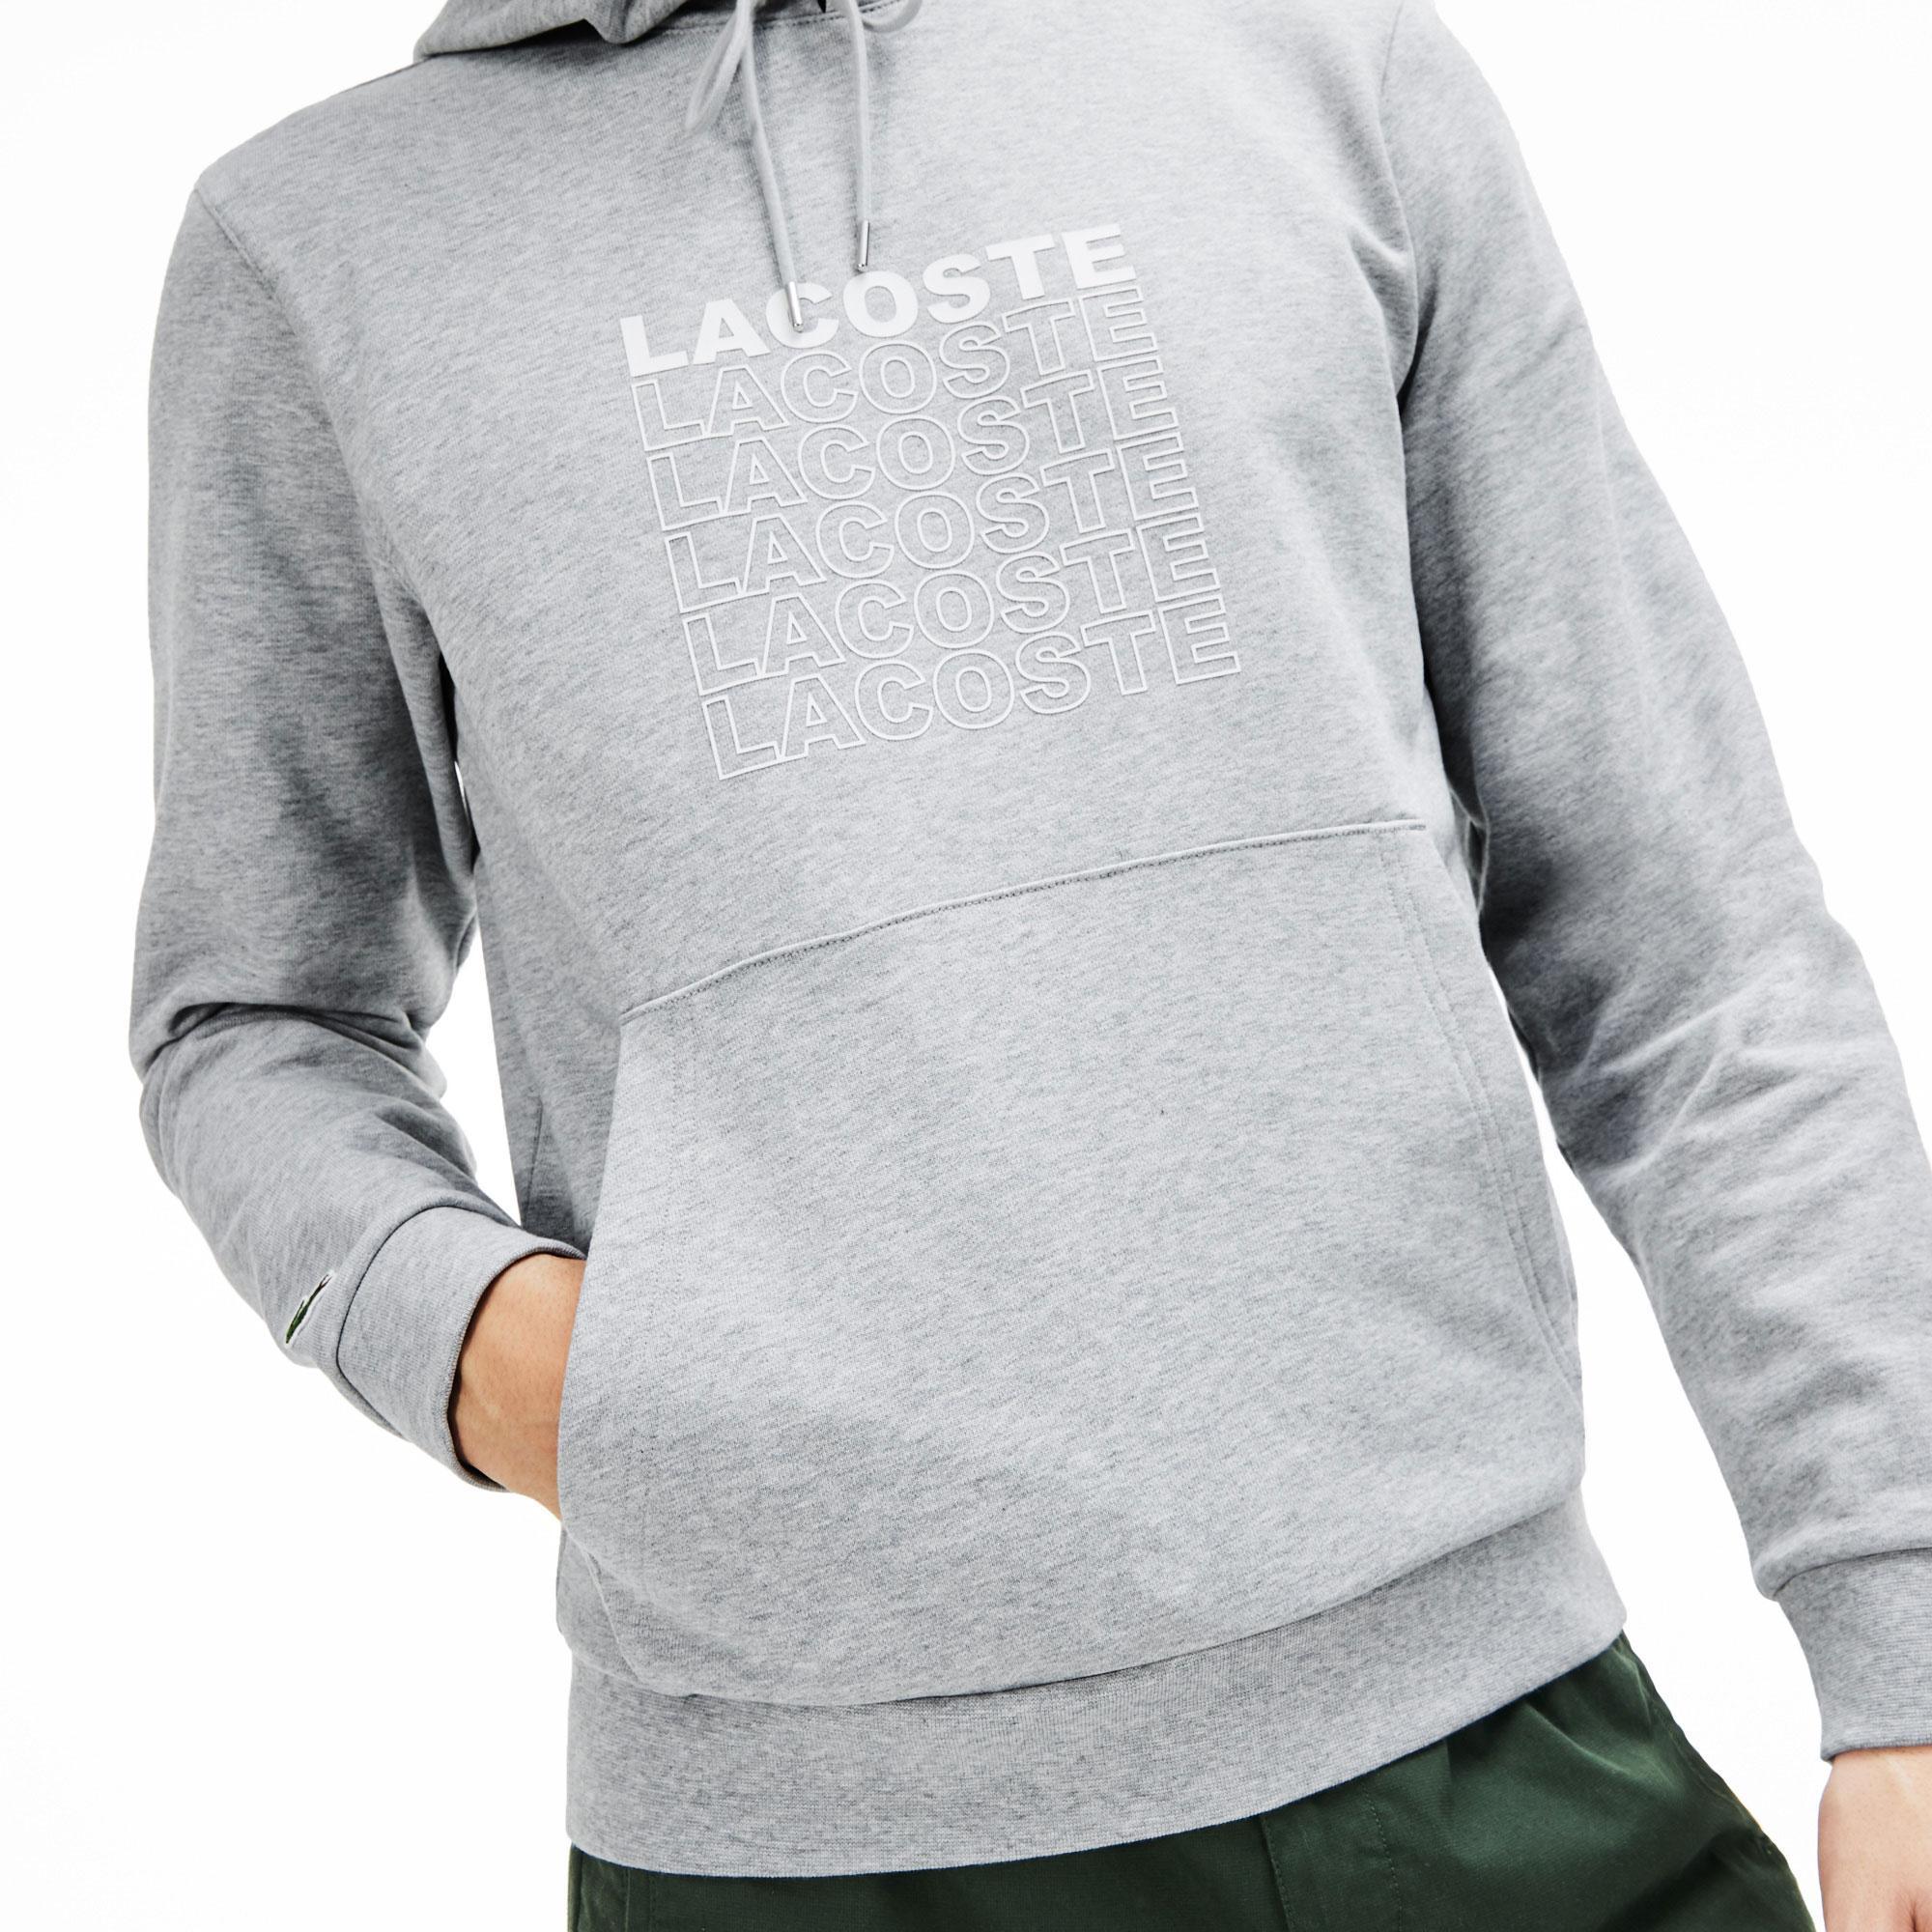 Lacoste Bluza Męska